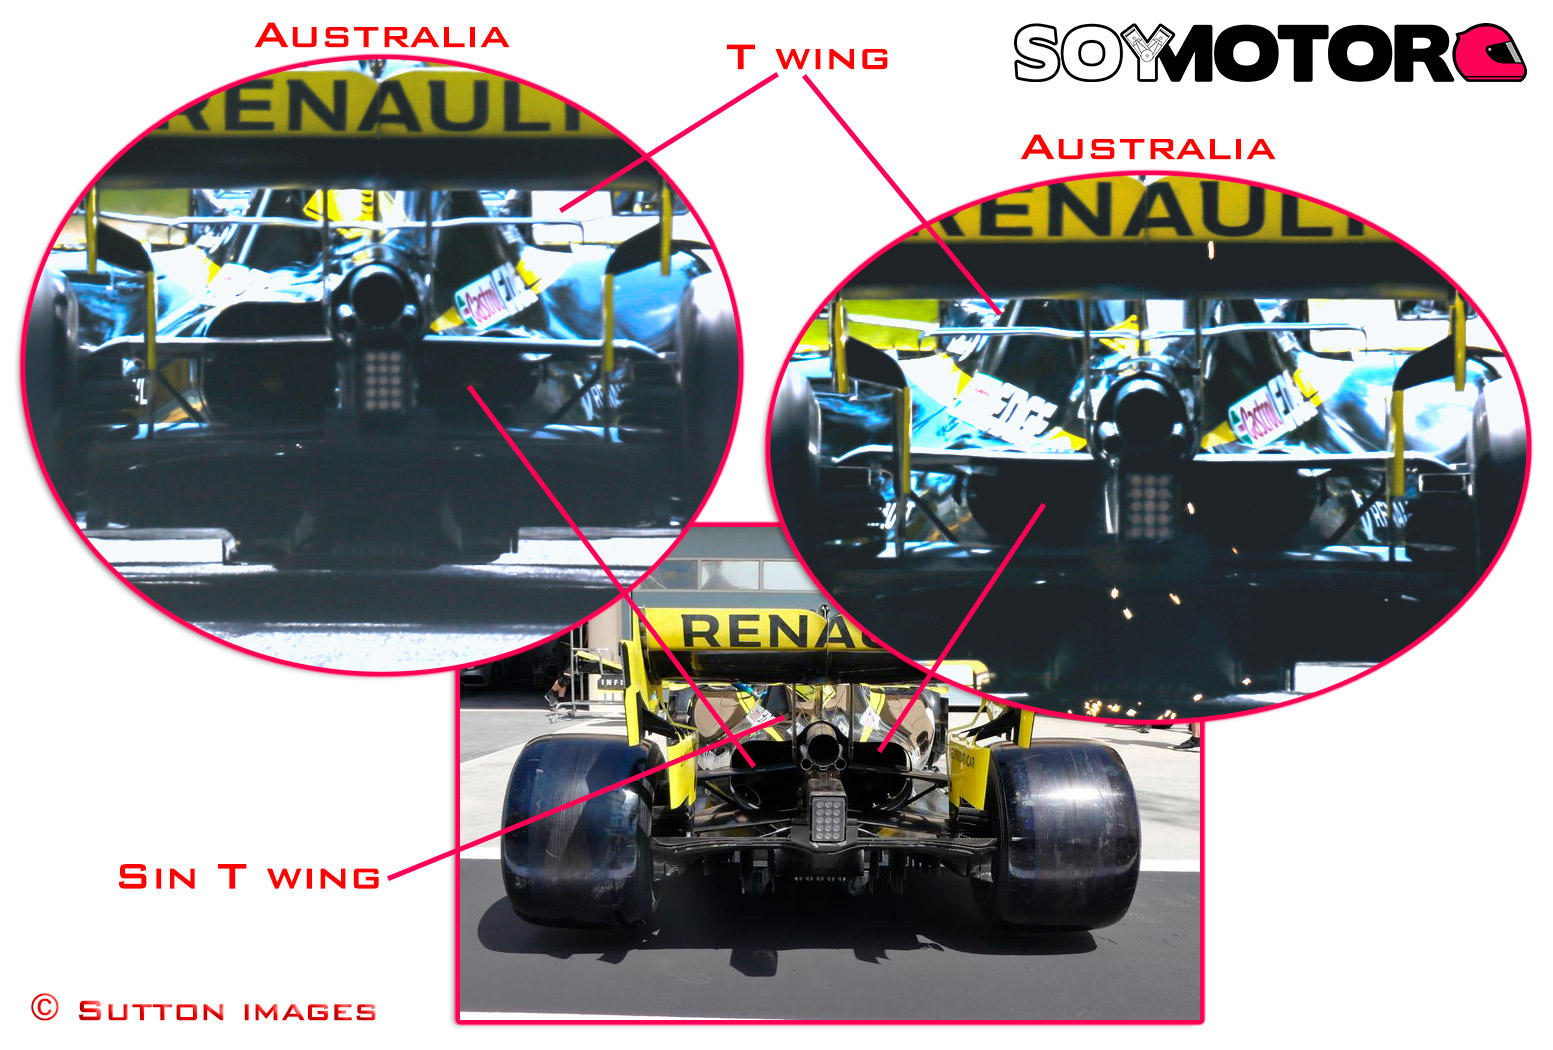 renault-tapa-motor-y-t-wing-soymotor.jpg